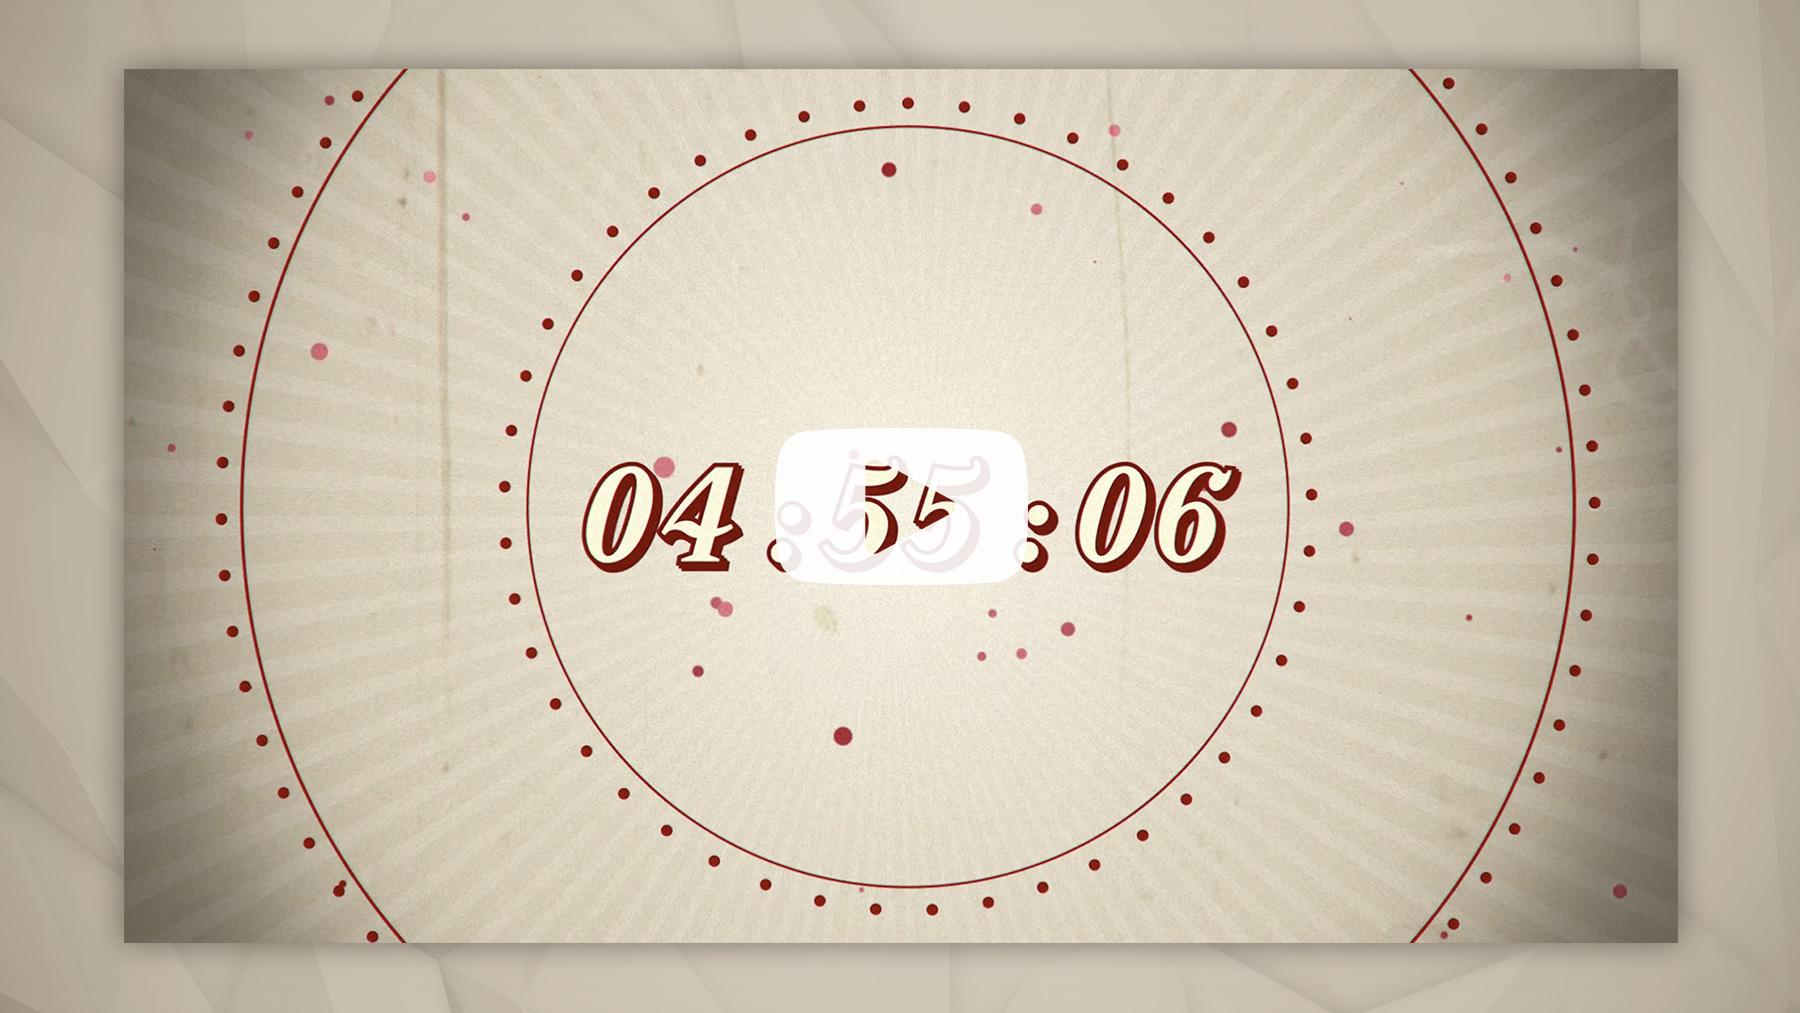 myfc countdown video